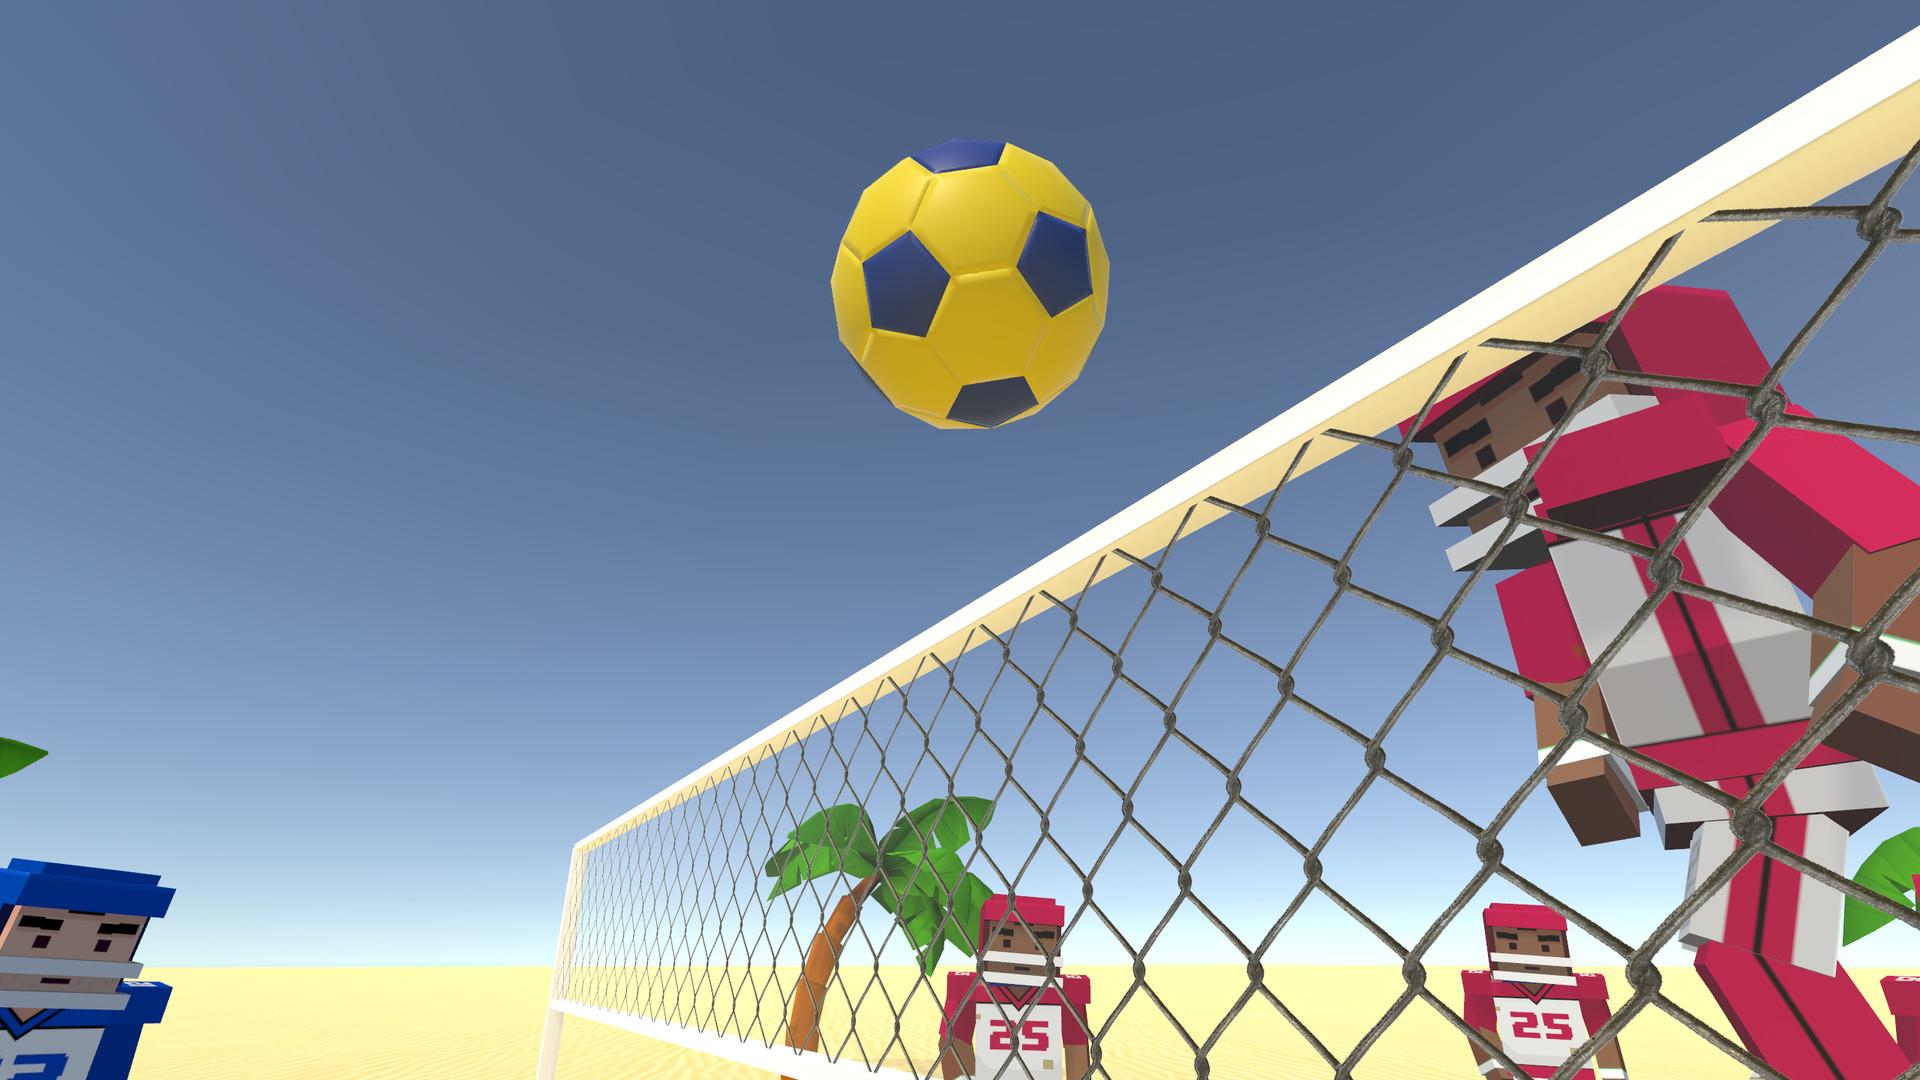 Oculus Quest 游戏《Volleyball Fever》狂热排球插图(1)